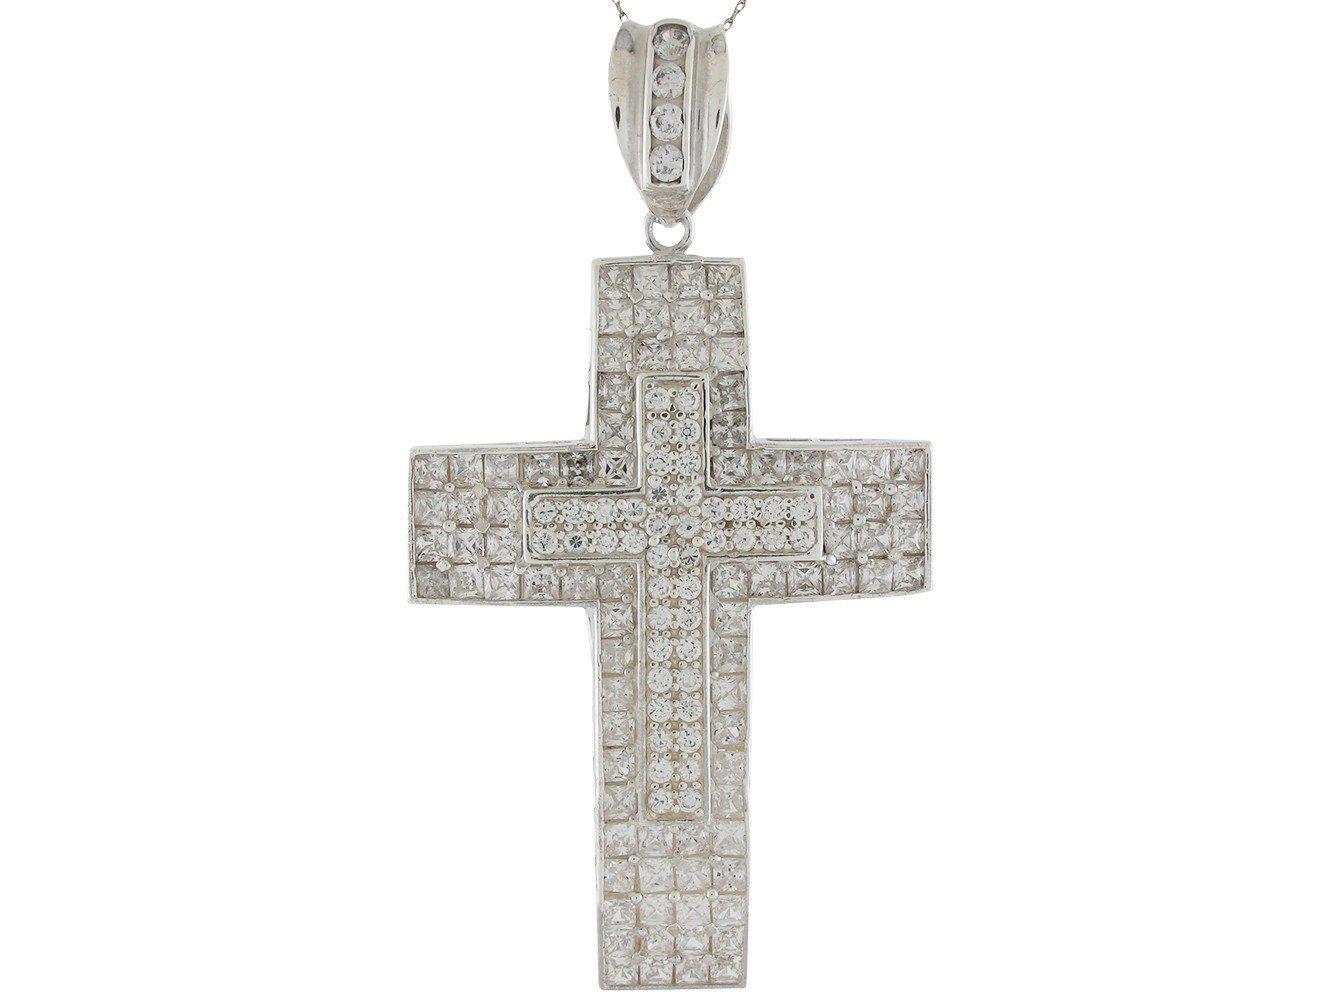 Brilliant White CZ Accented Huge Double Latin Cross Pendant 14k White Gold